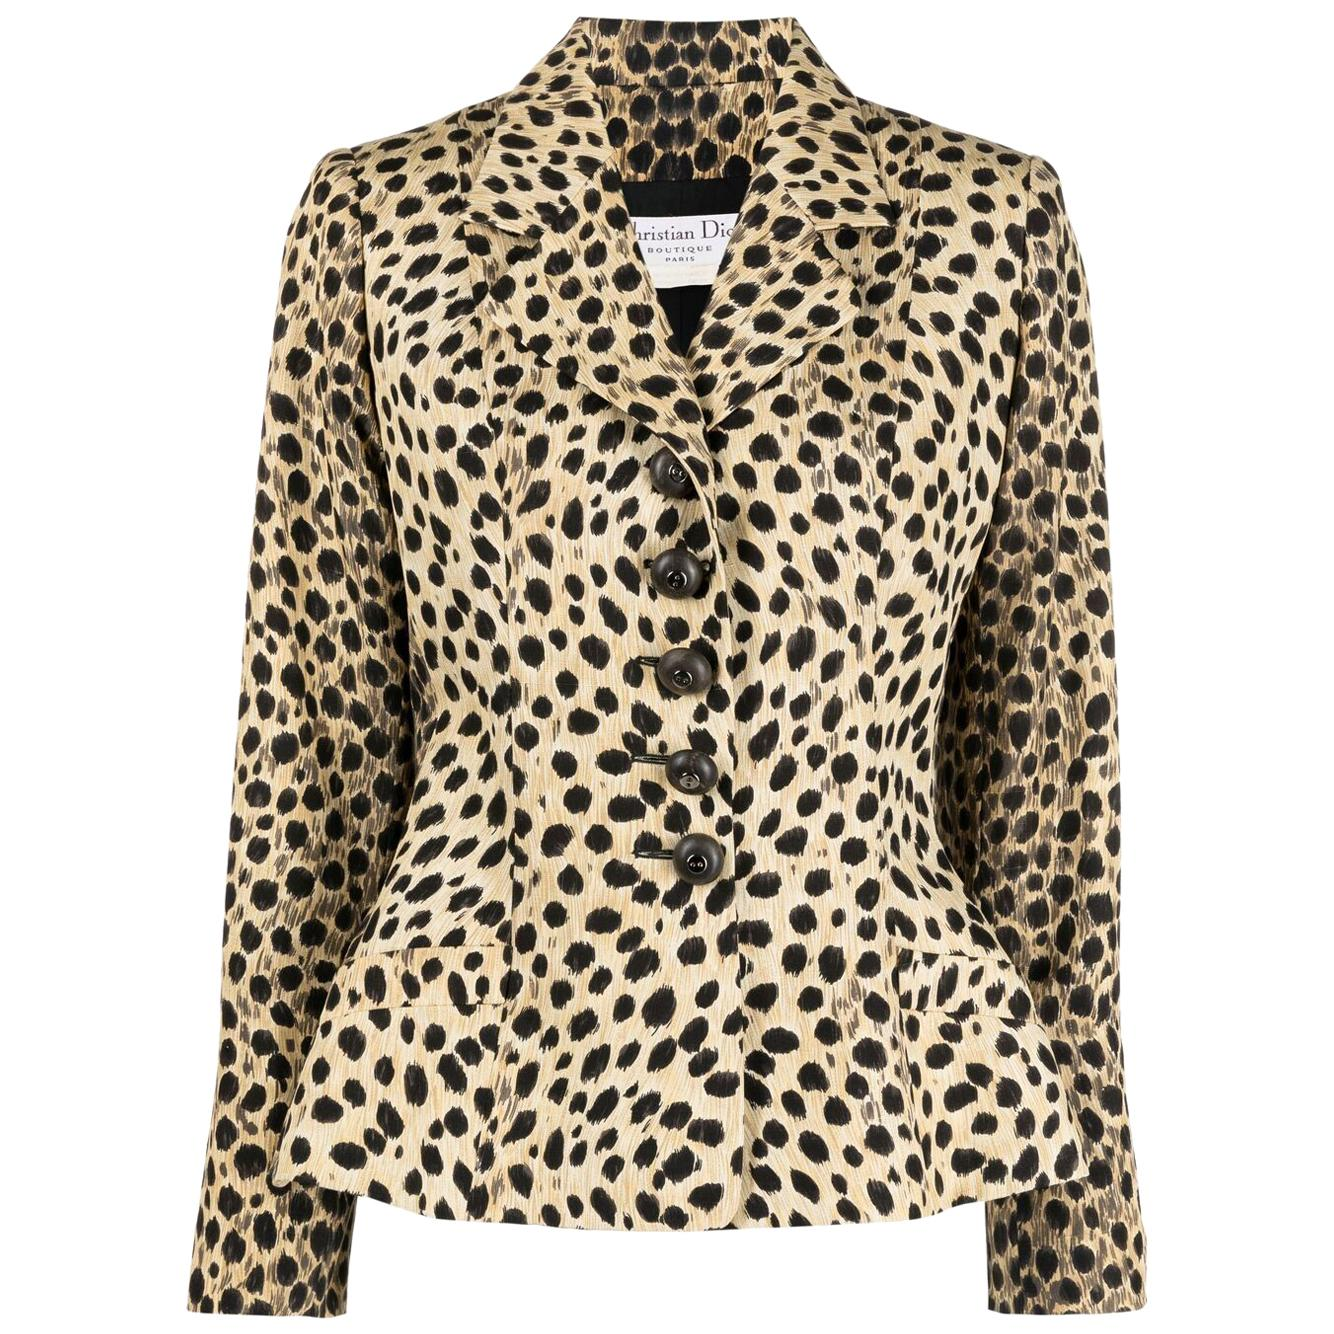 1990s Christian Dior Bar Jacket  Silk Animal Print